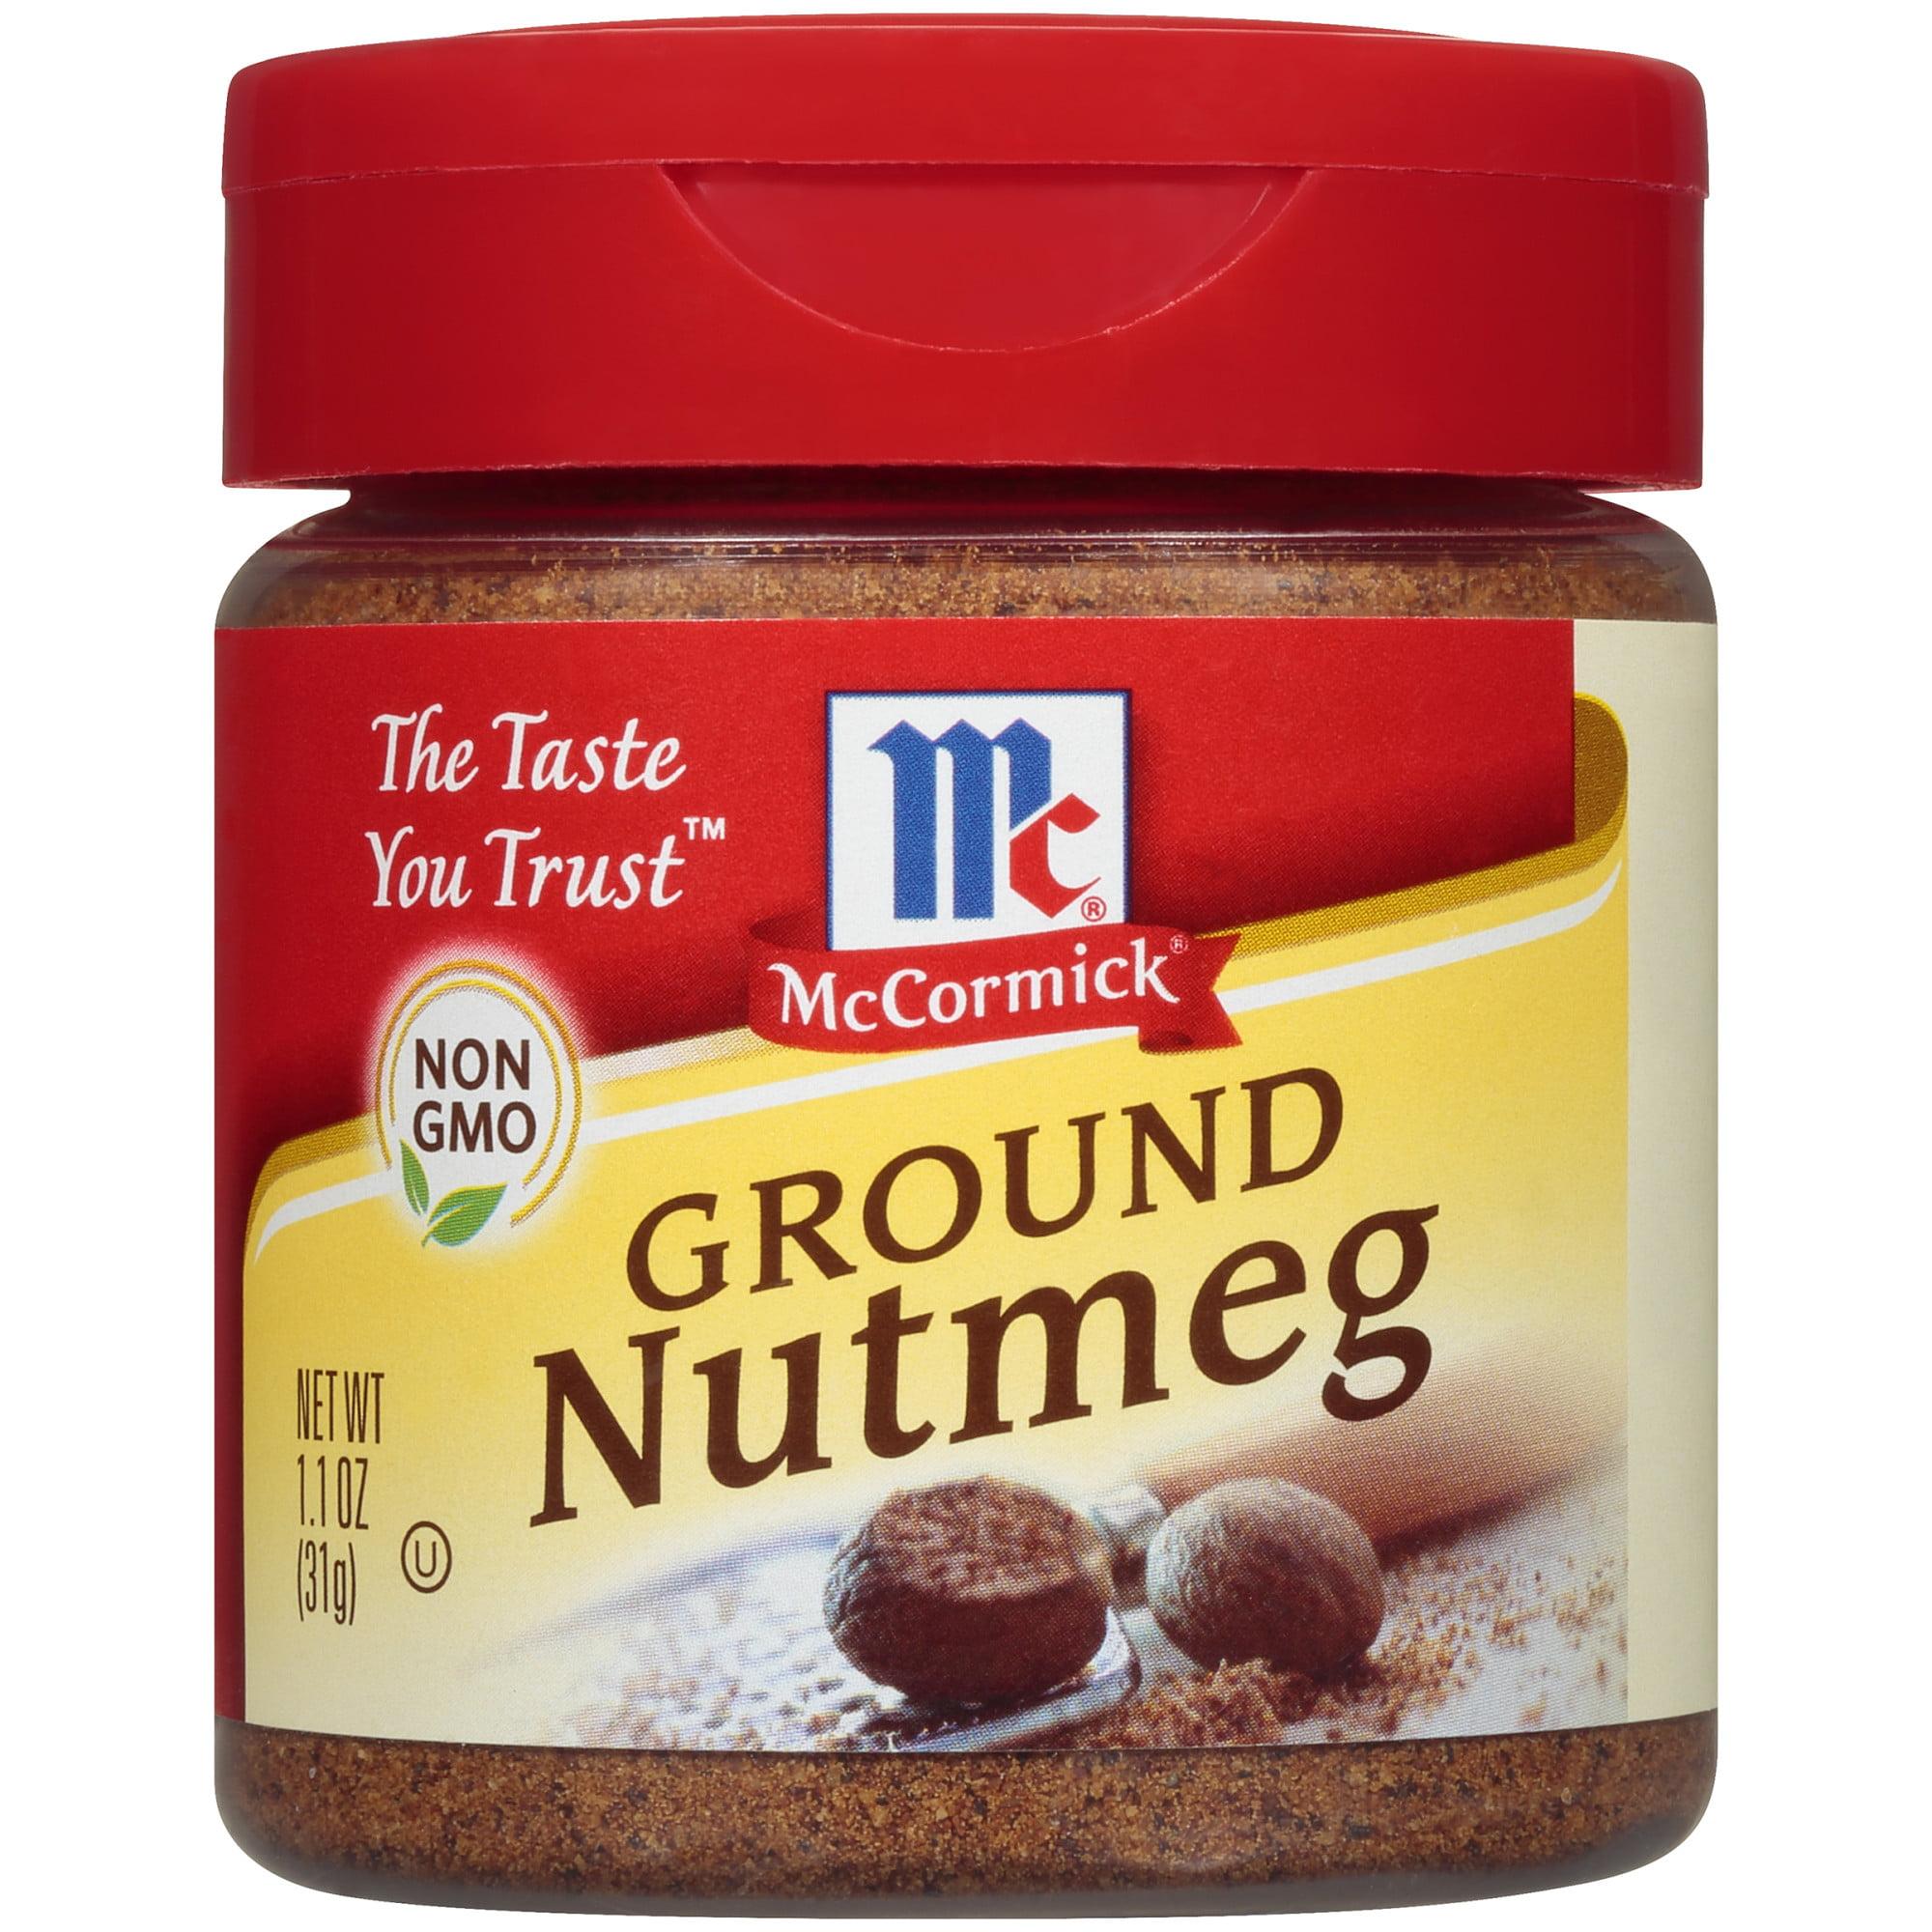 (2 Pack) McCormick Ground Nutmeg, 1.1 oz